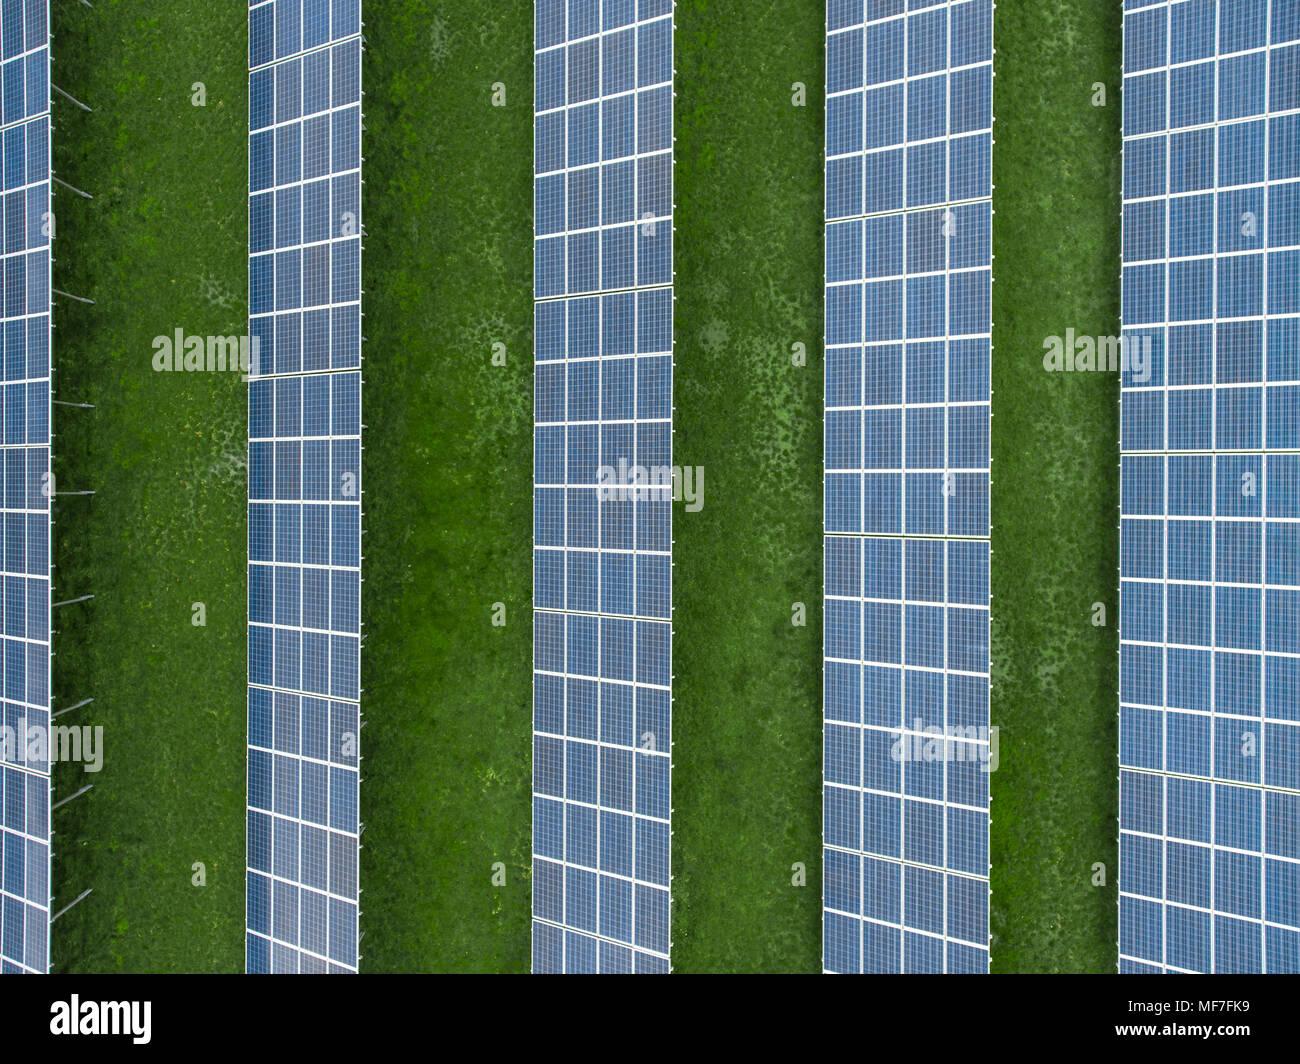 Alemania, Baviera, vista aérea de paneles solares Imagen De Stock